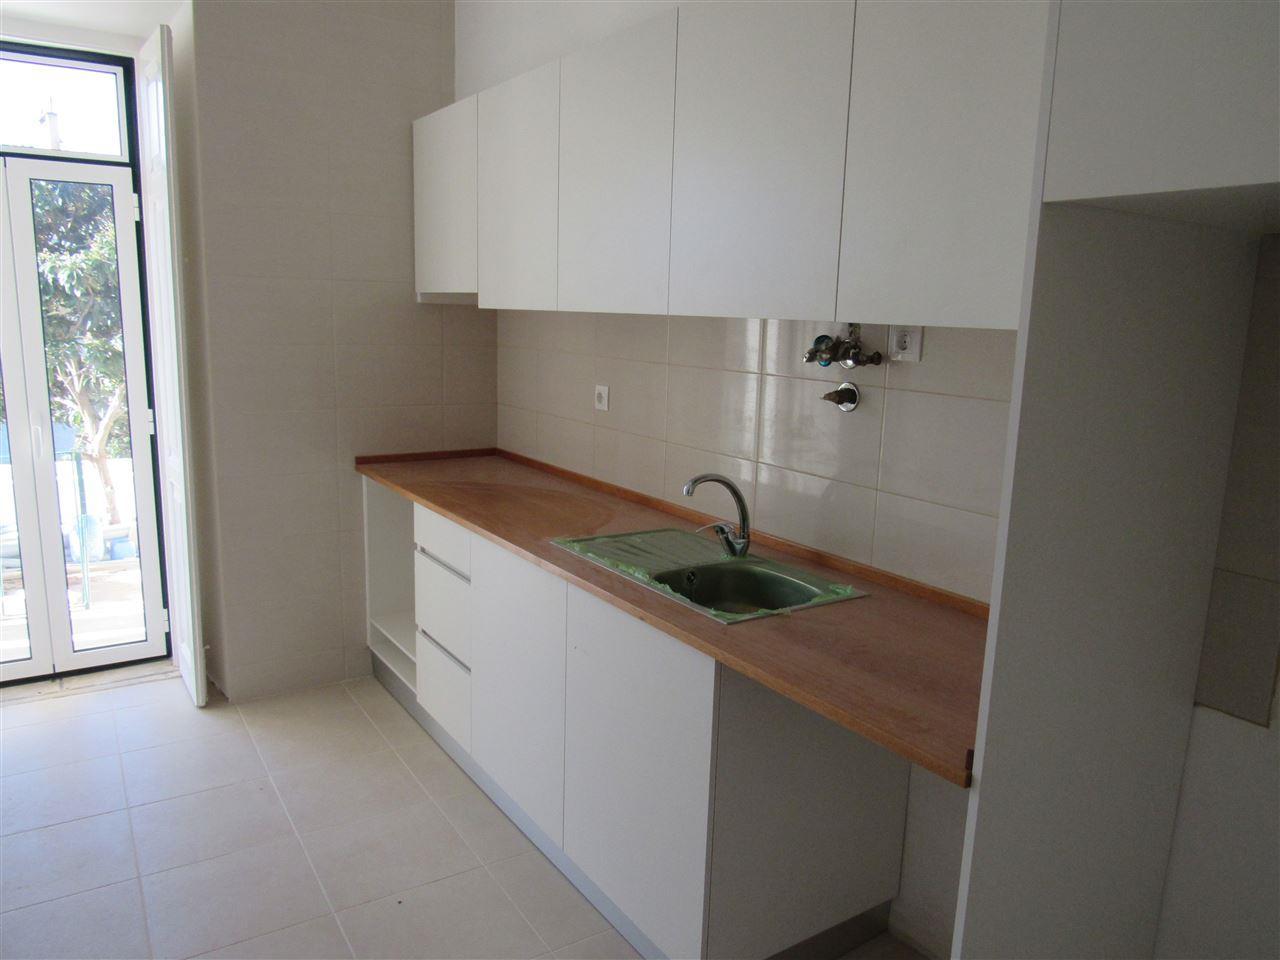 Apartment for Sale at Flat, 4 bedrooms, for Sale Lisboa, Lisboa, 1069-157 Portugal